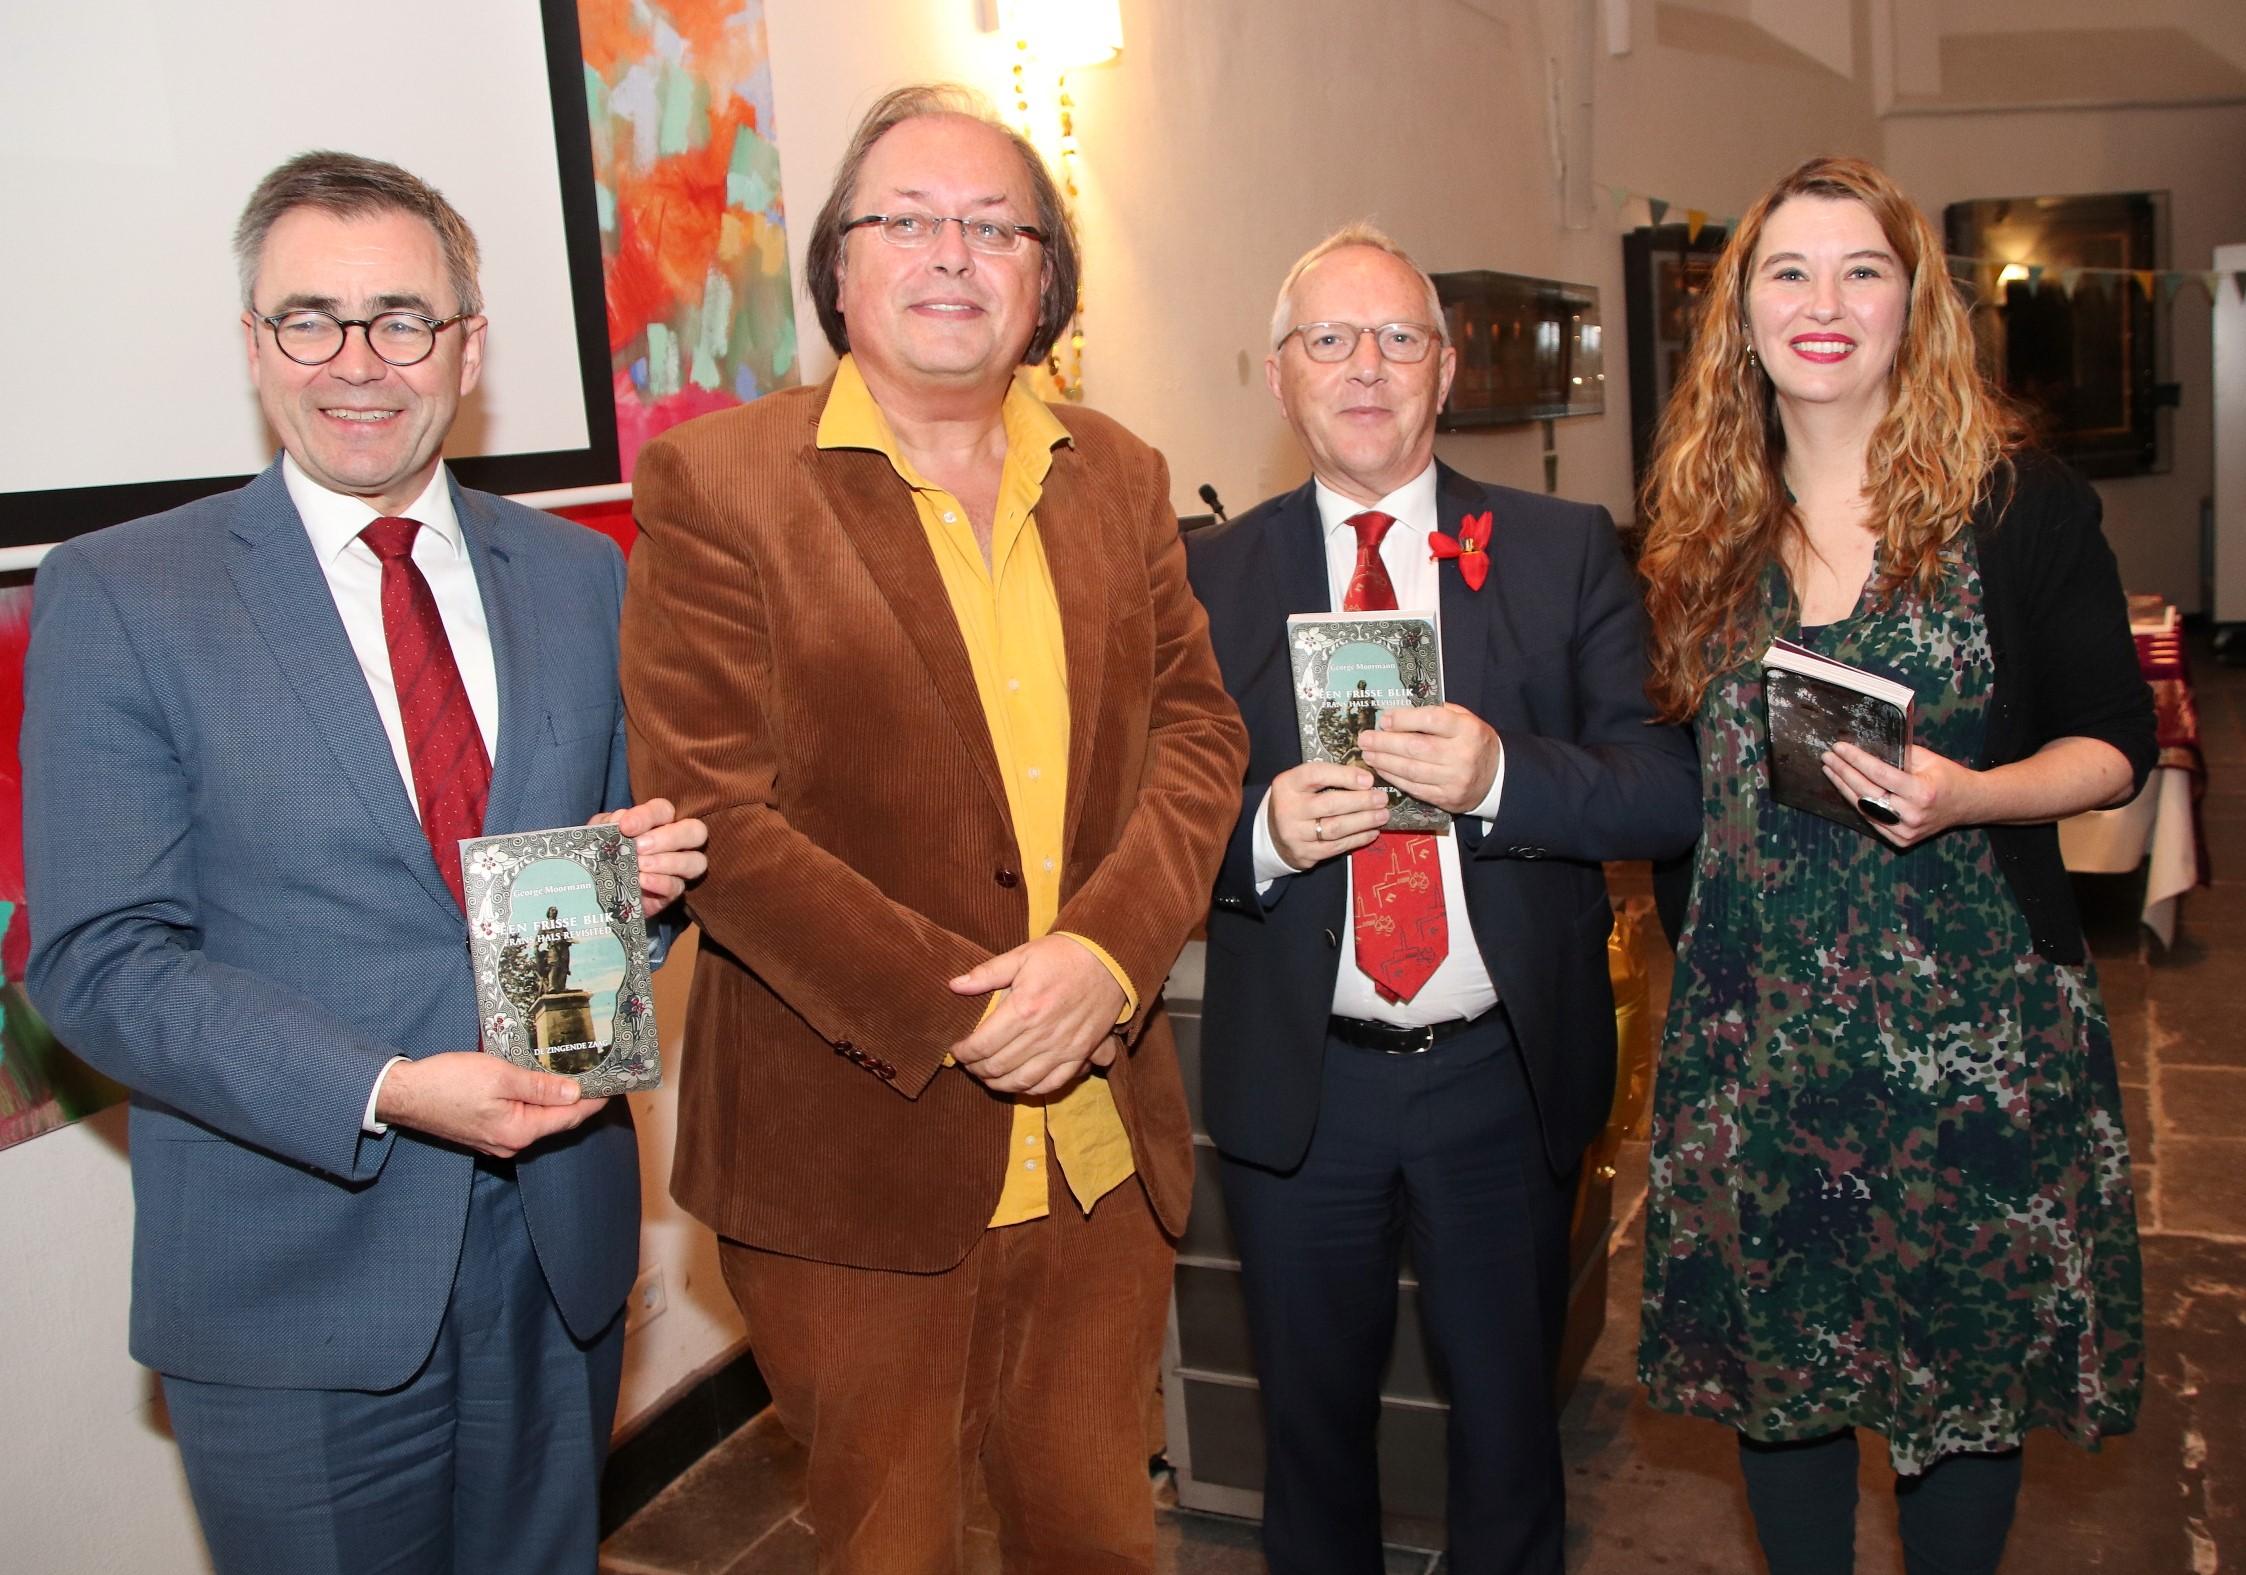 Van linksaf: Burgemeester Wienen, George Moormann, Lieuwe Zoodsma en Ann Demeester (Foto: Willem Brand)